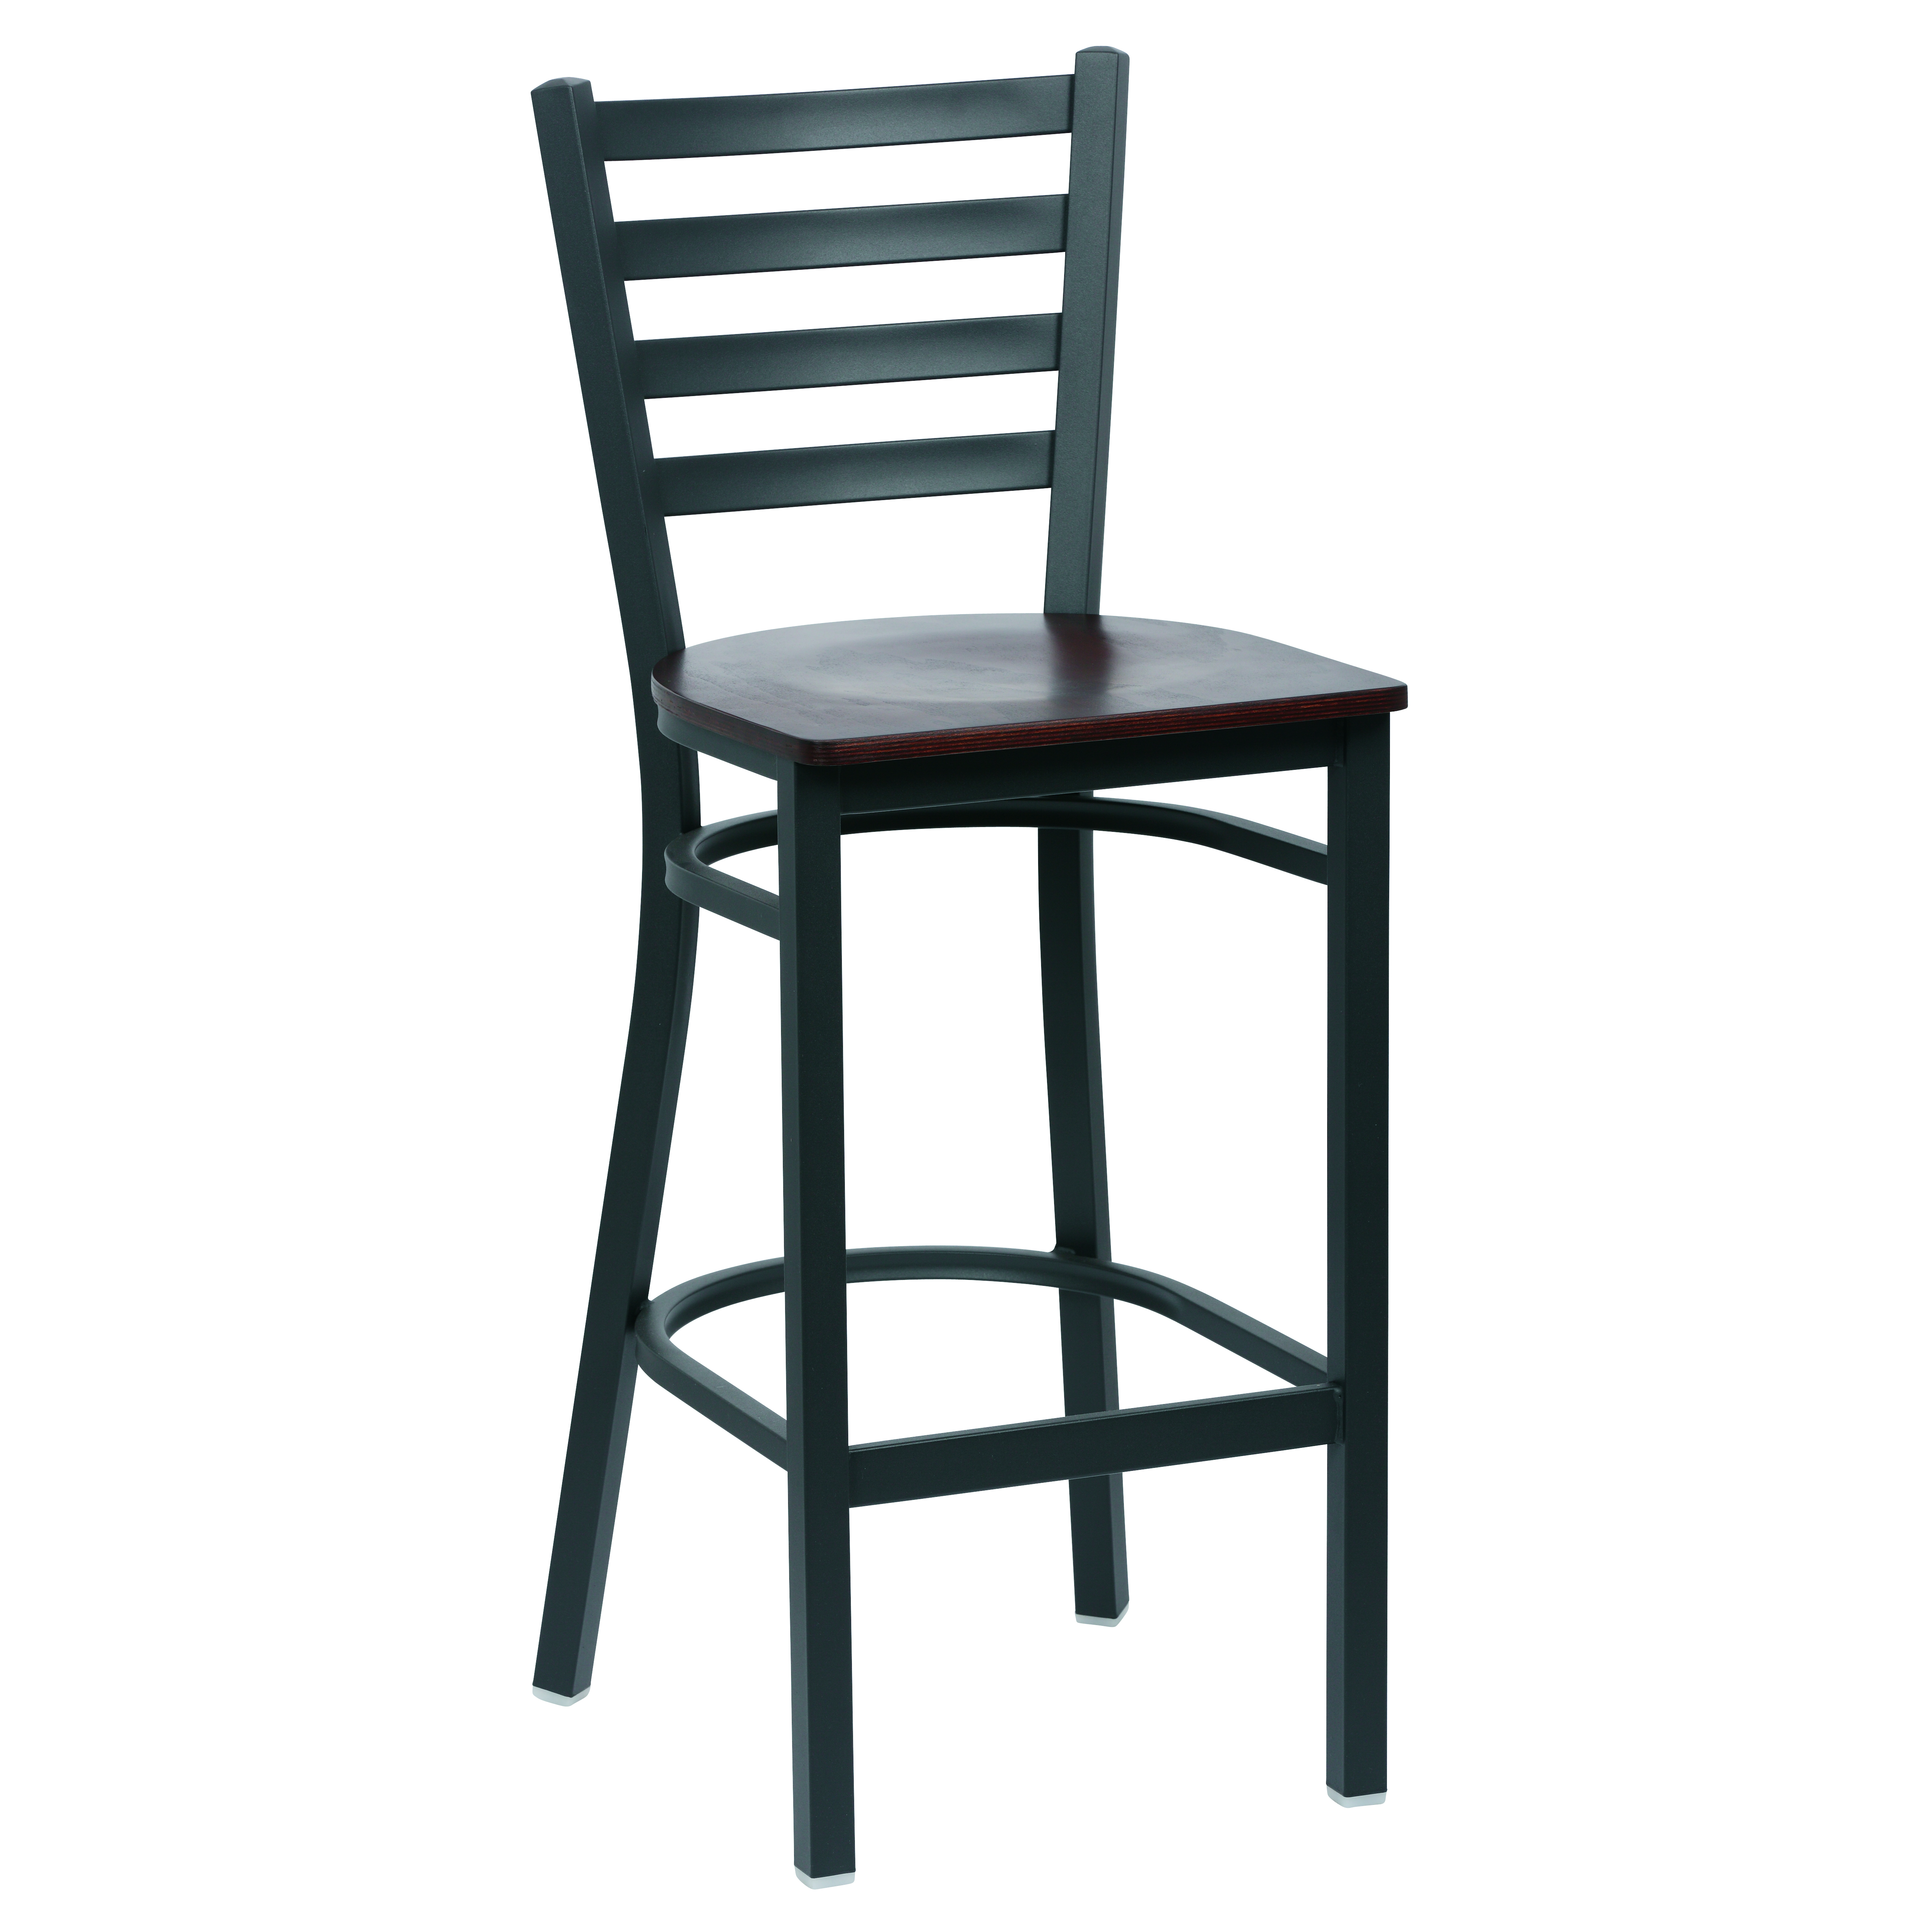 Royal Industries ROY 9002 W bar stool, indoor